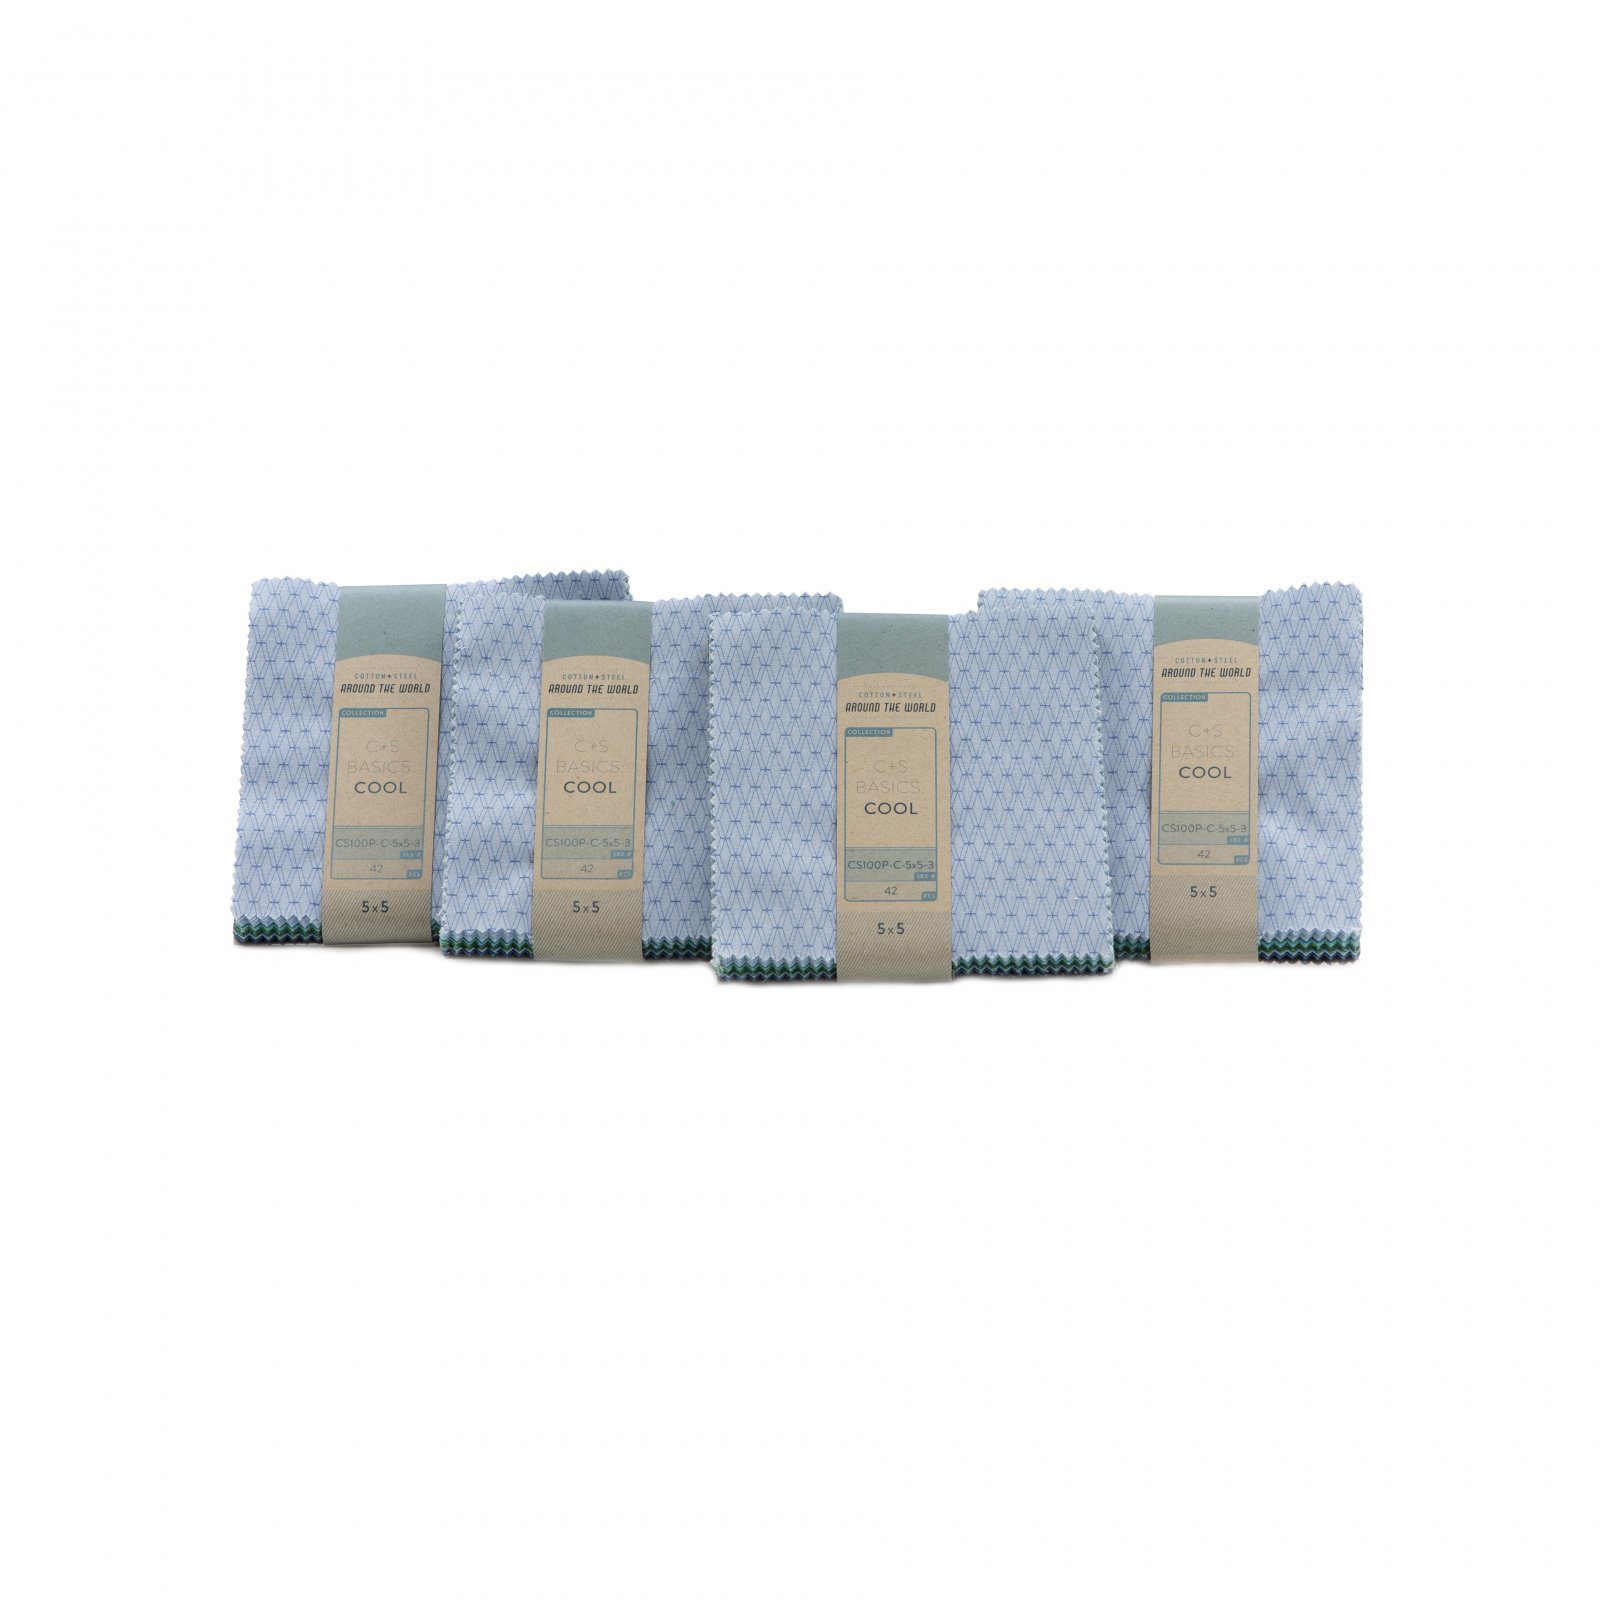 Cotton+Steel Basics Cool 5x5 Pack, 42pcs